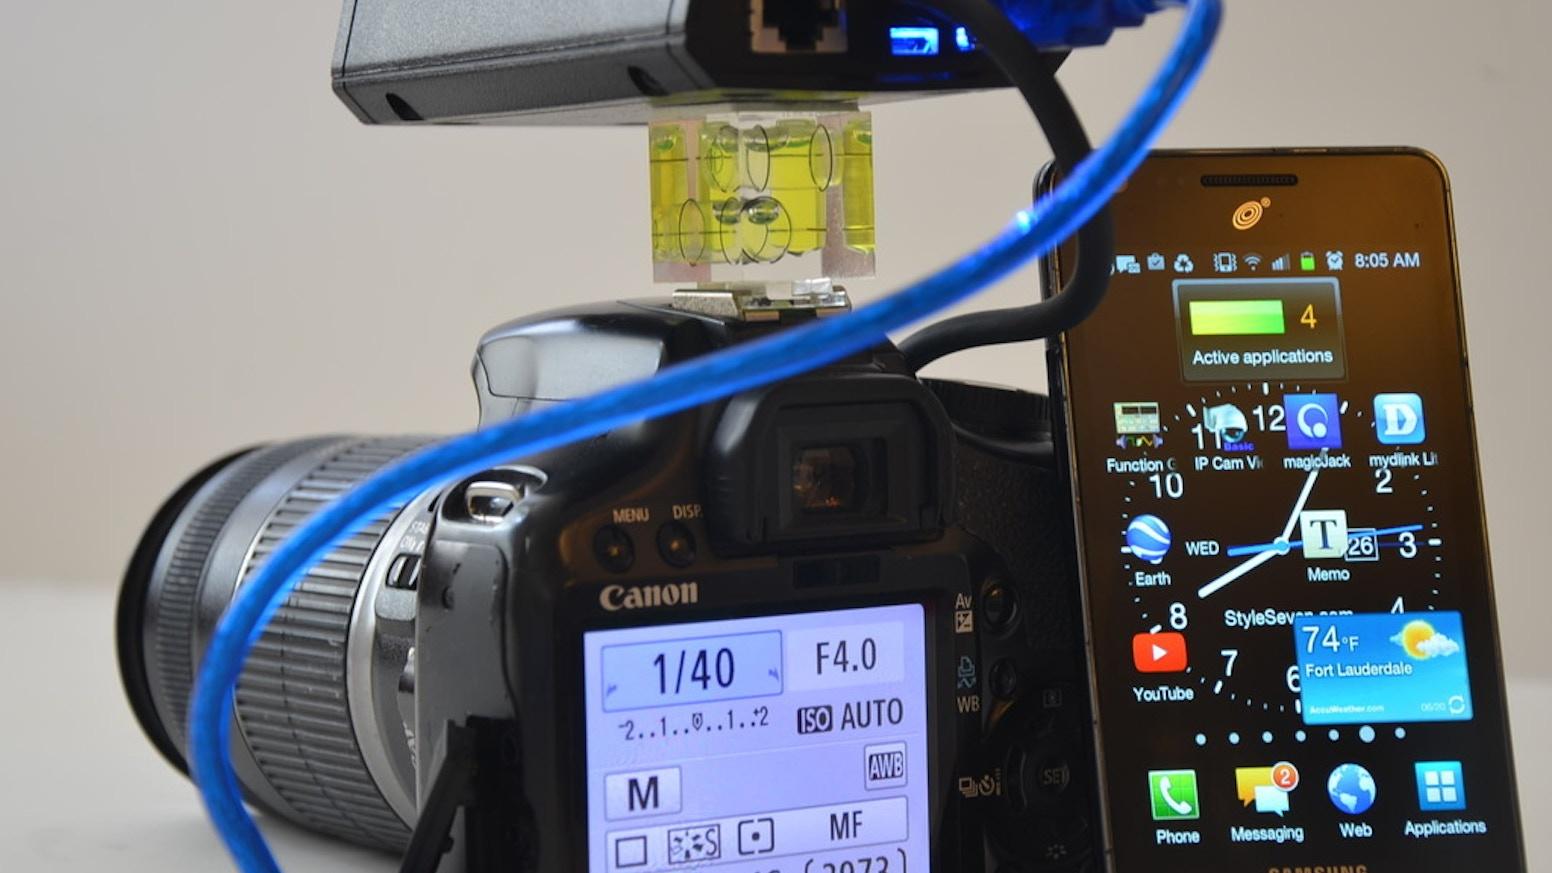 CamsFormer Next Gen DSLR Tether,High Speed Trigger,PTZ by Clive